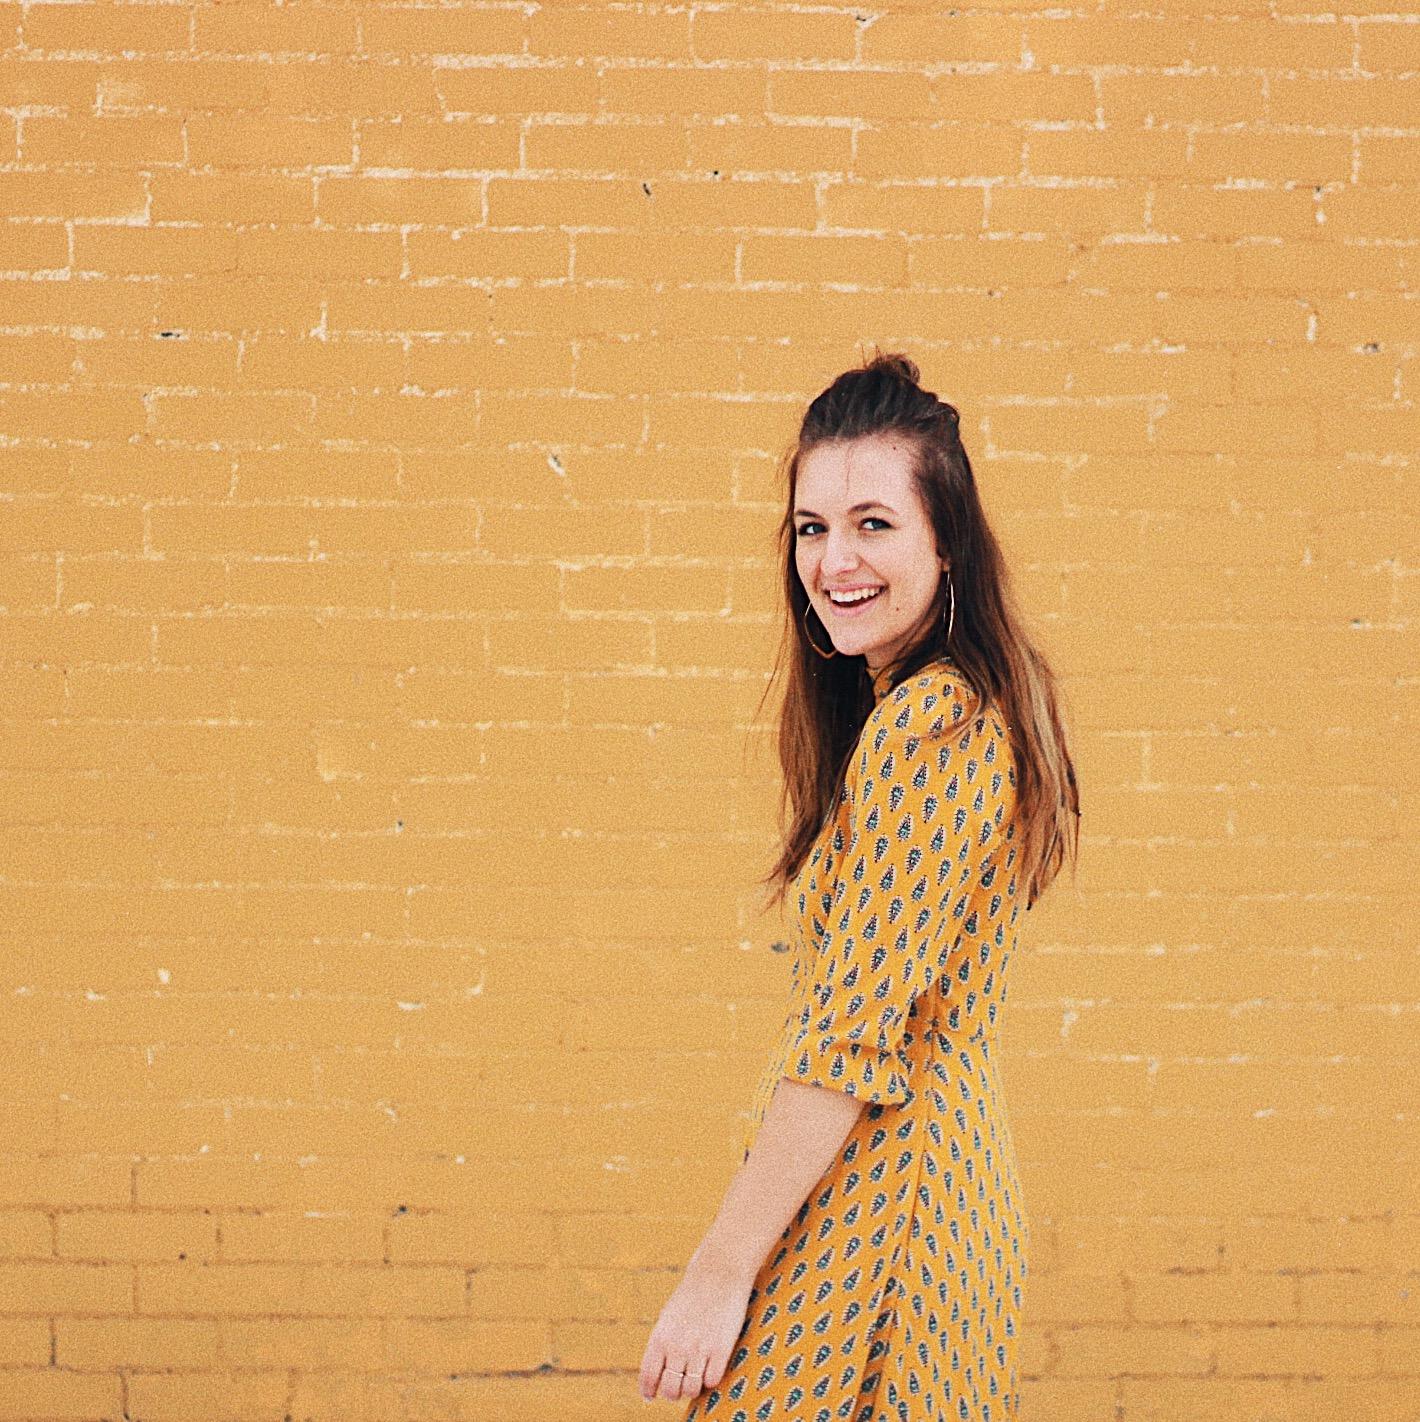 yellow wall provo